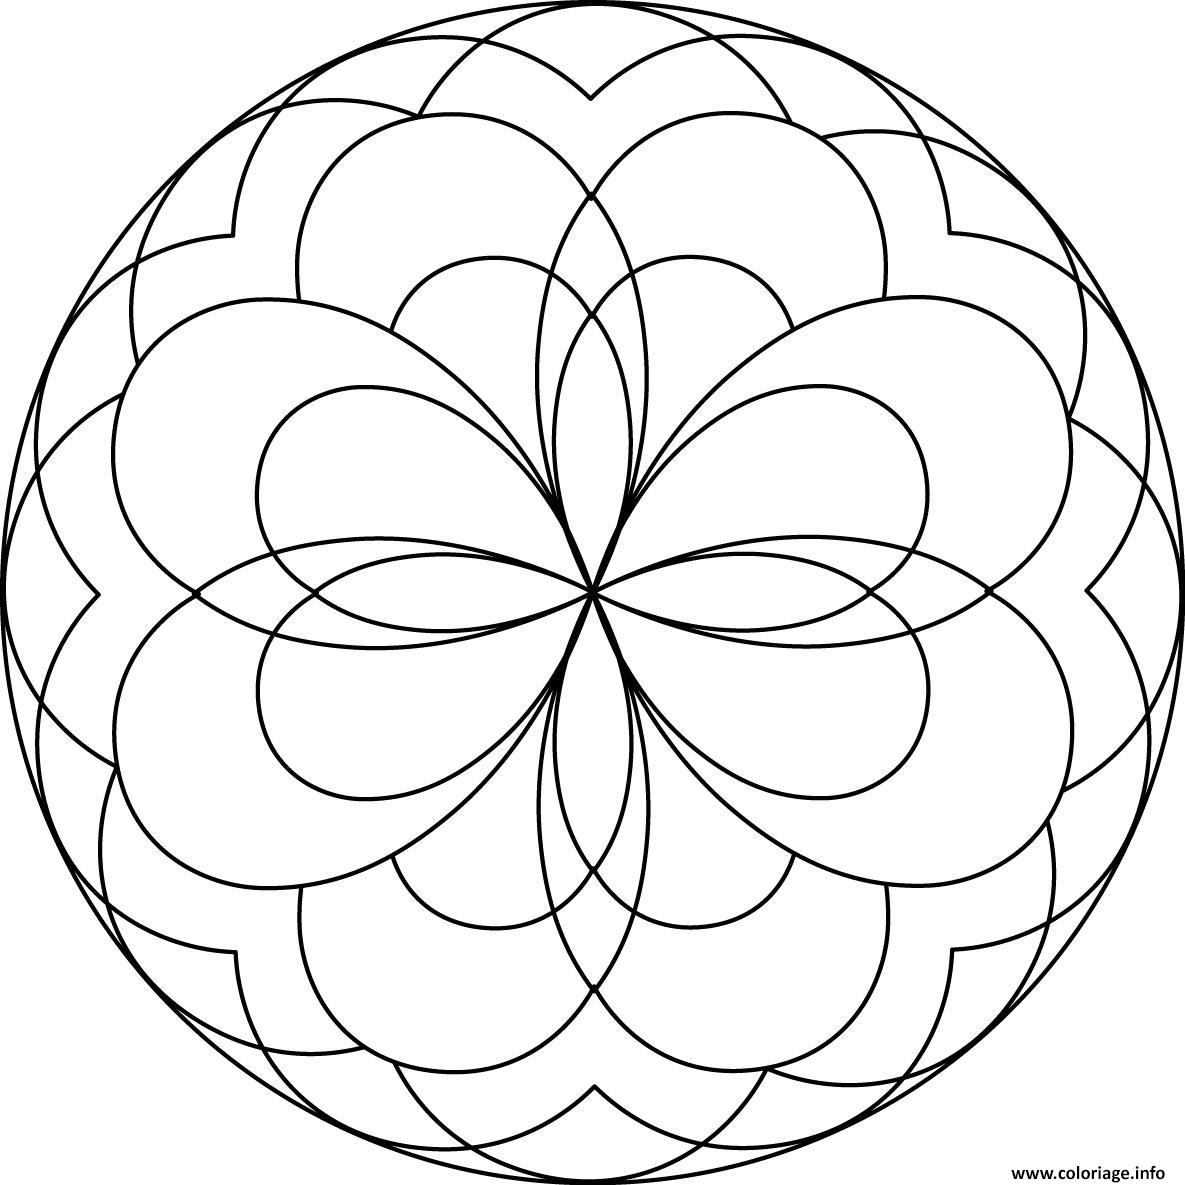 Coloriage Mandala Facile 60 Dessin à Mandala À Imprimer Facile